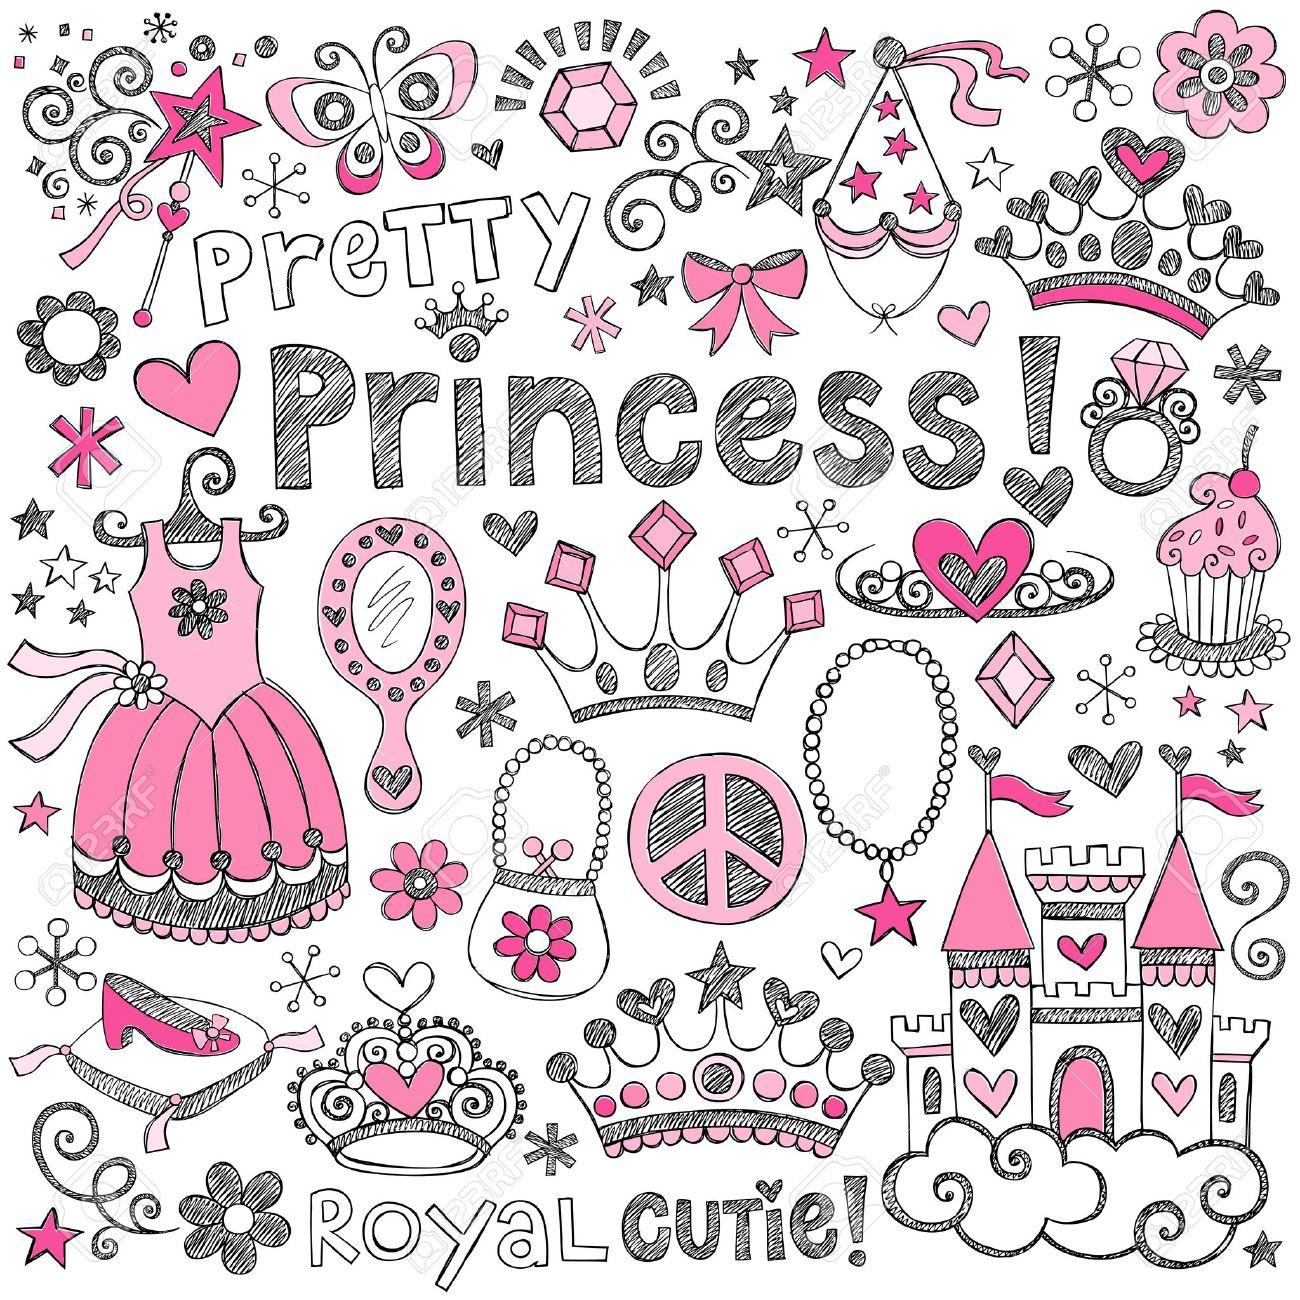 Hand-Drawn Sketchy Fairy Tale Princess Tiara Crown Notebook Doodle Design Elements Set Vector Illustration Stock Vector - 17164990